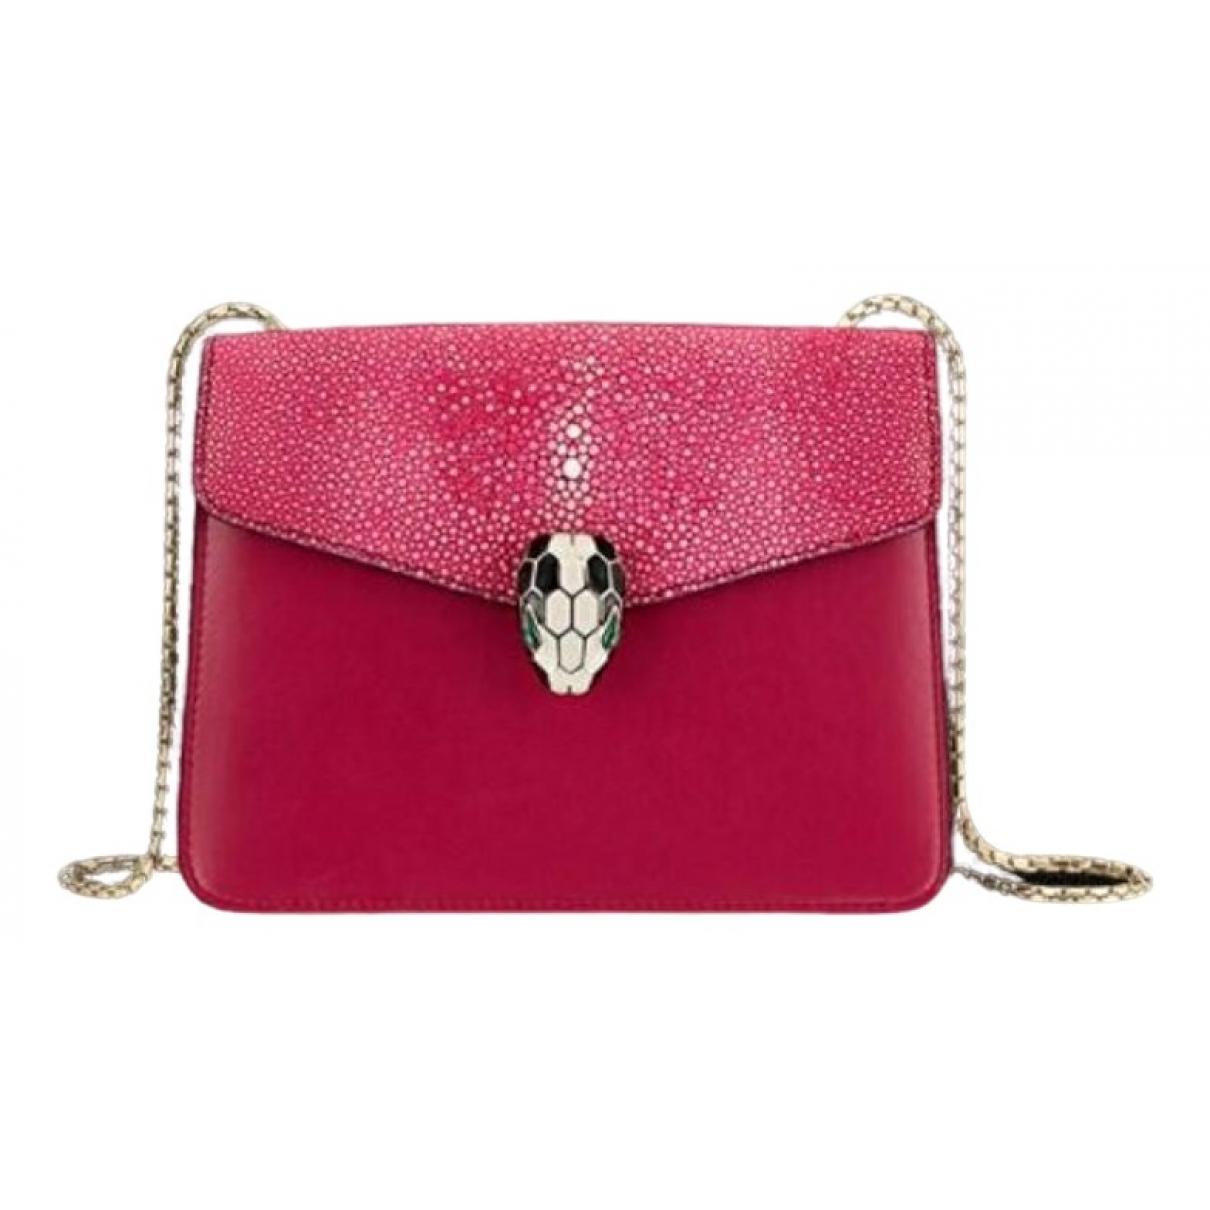 Bvlgari Serpenti Pink Leather handbag for Women \N